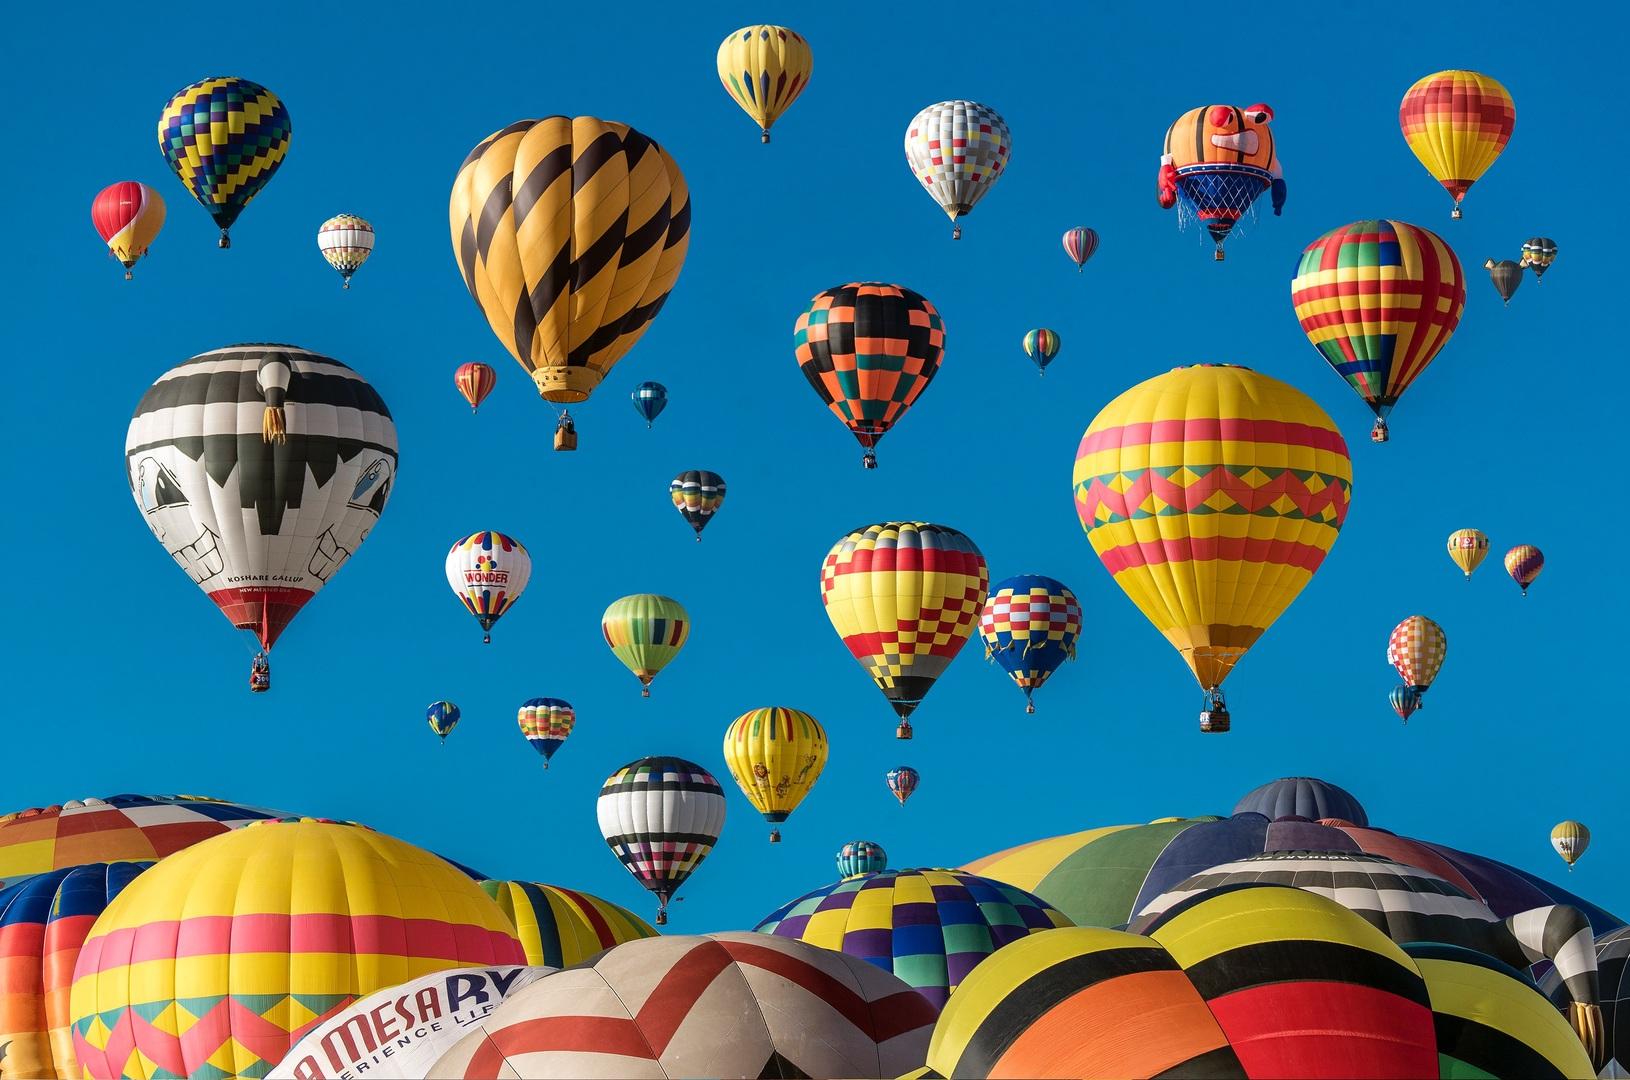 Hot air ballooning in Nepal (Pokhara).